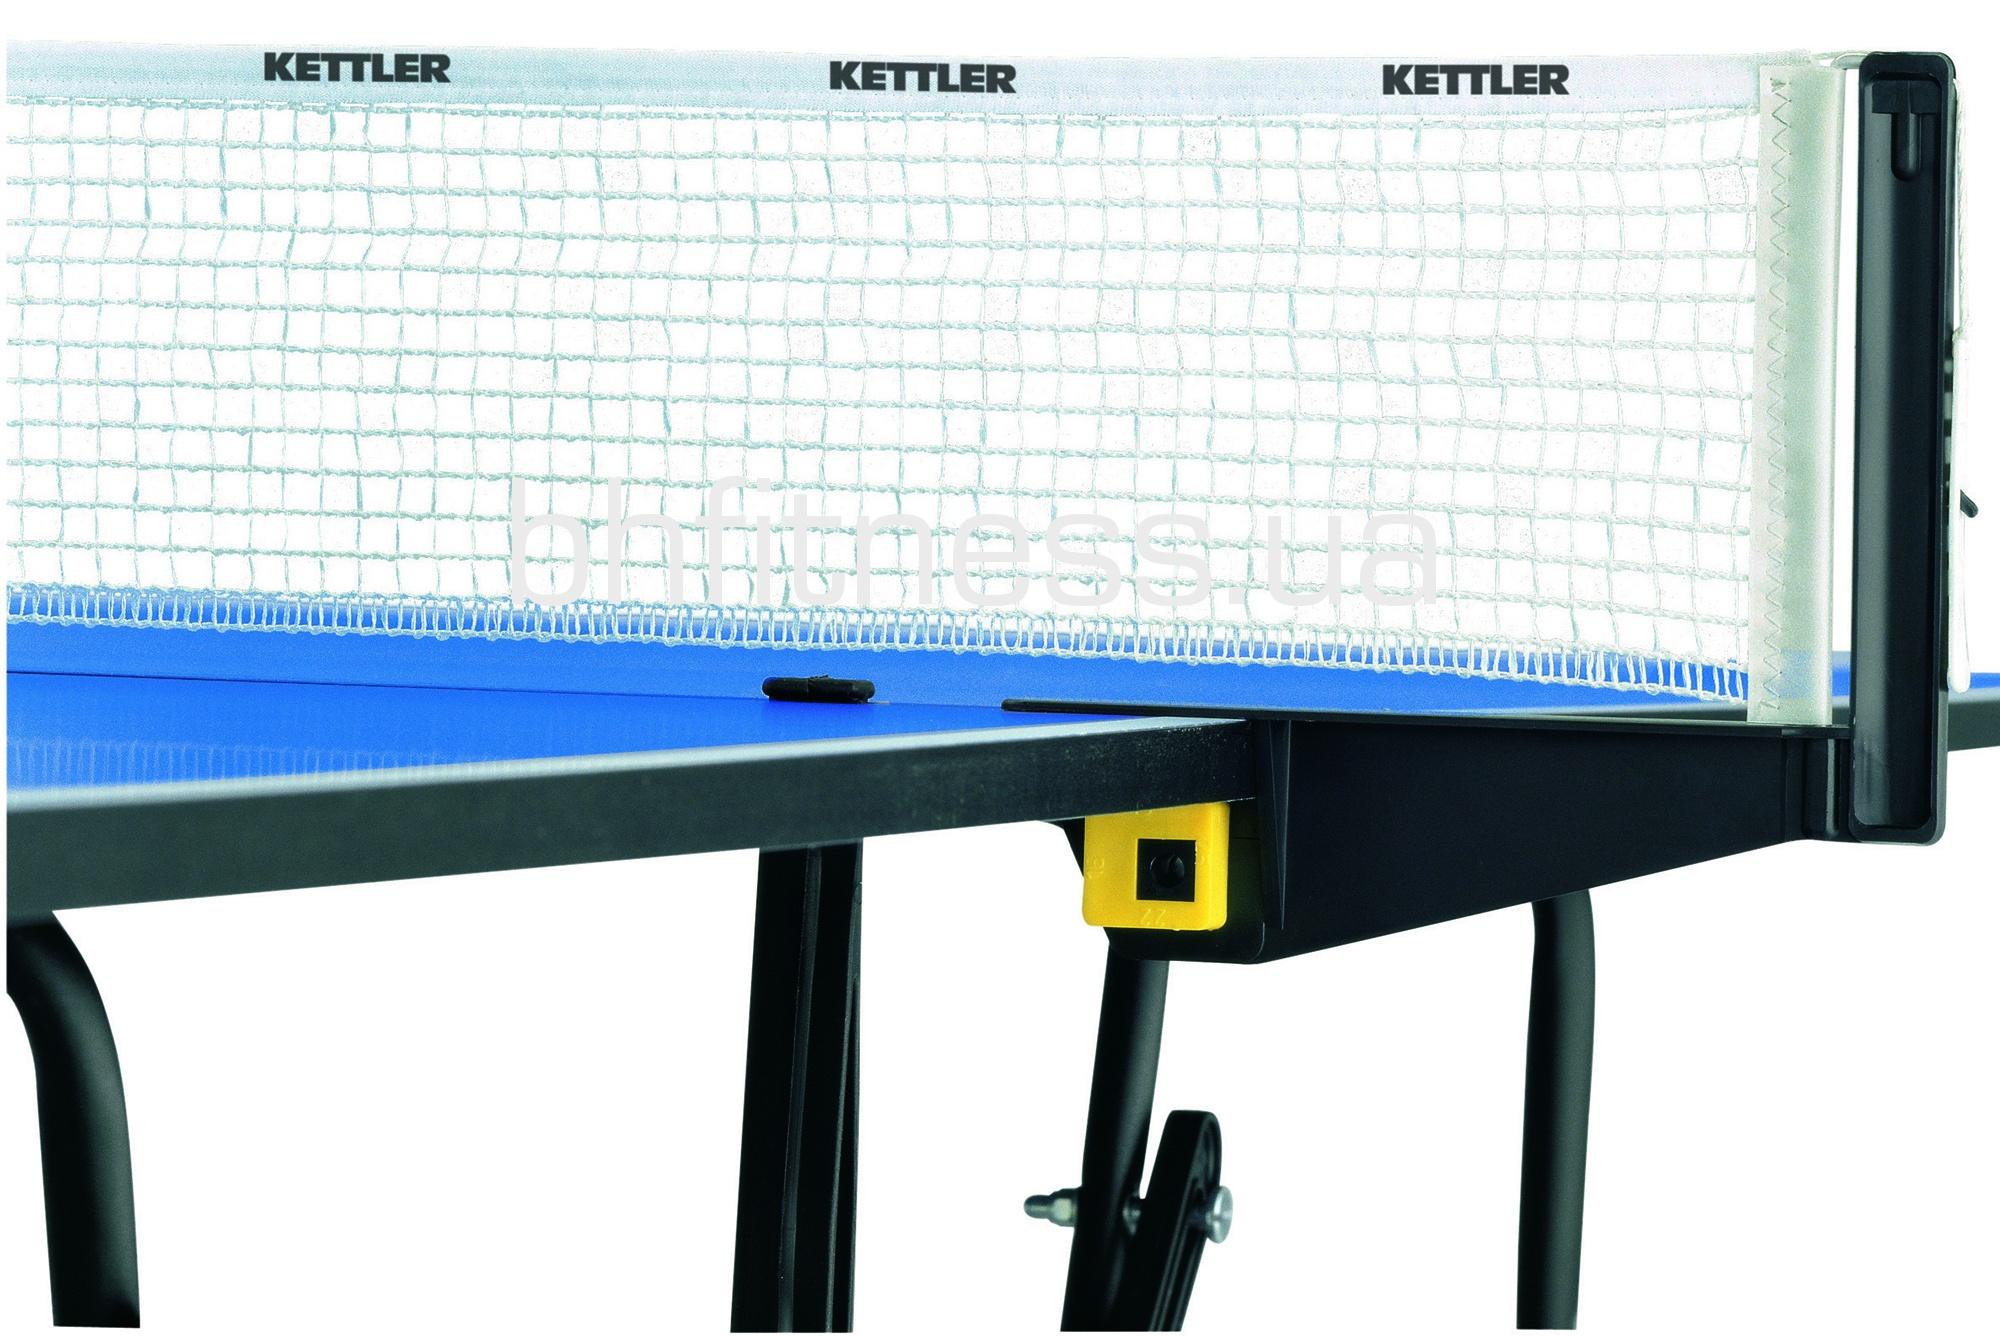 kettler Сетка теннисная Kettler Vario 7096-100